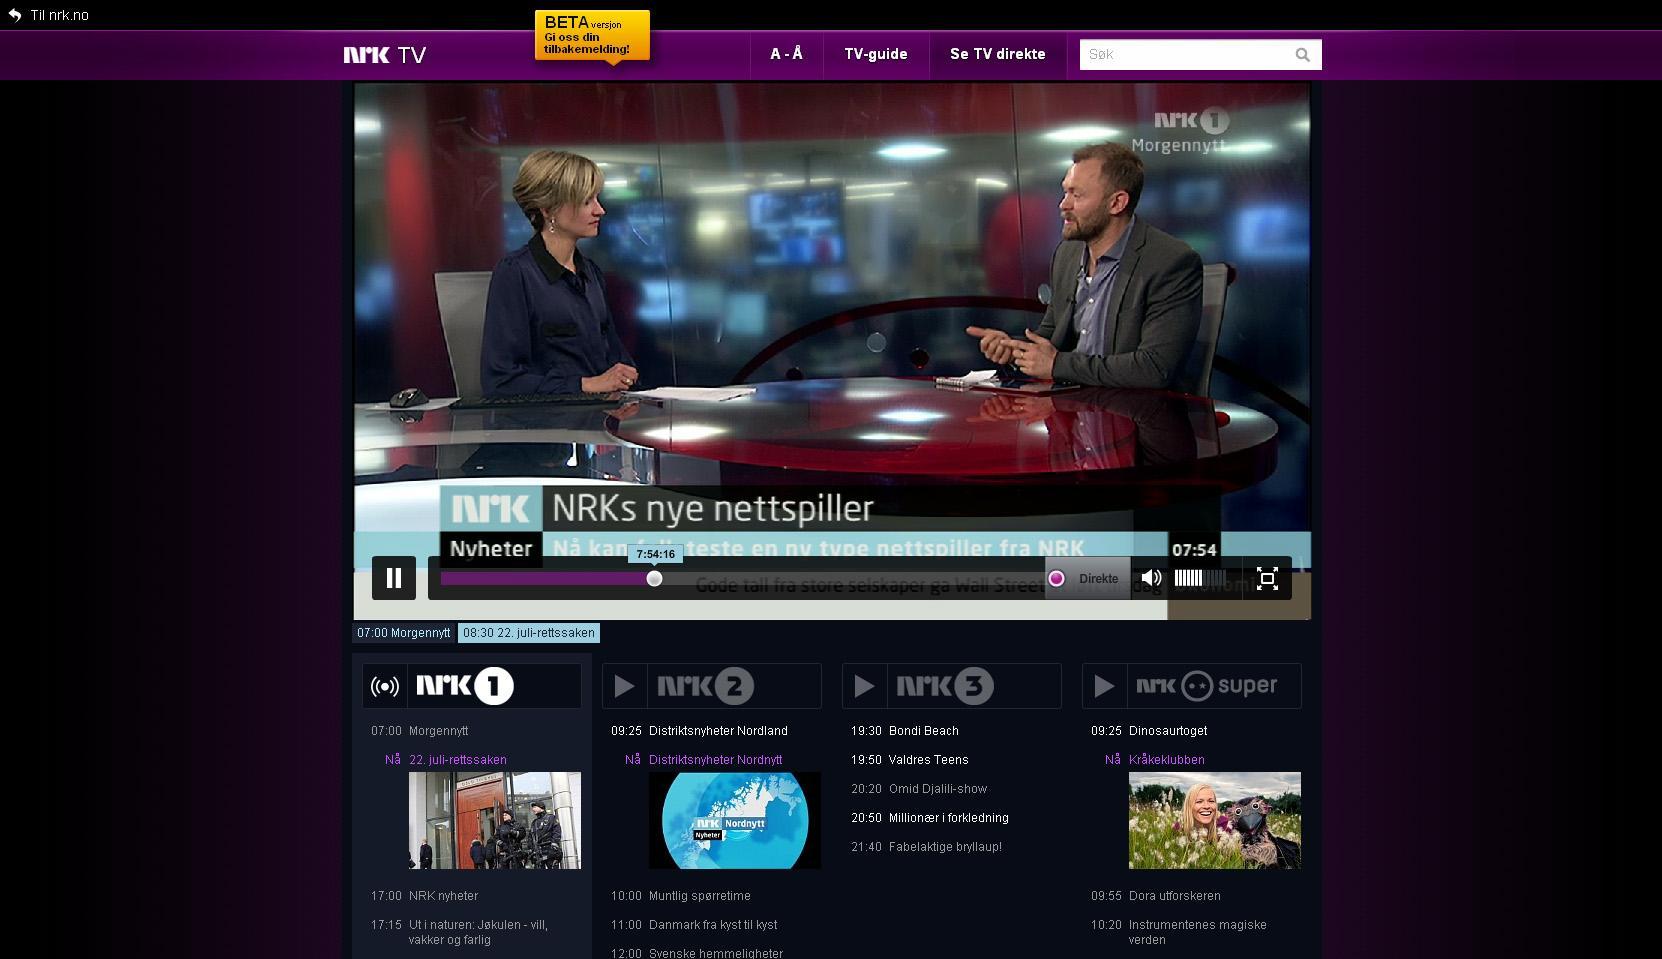 Se TV direkte